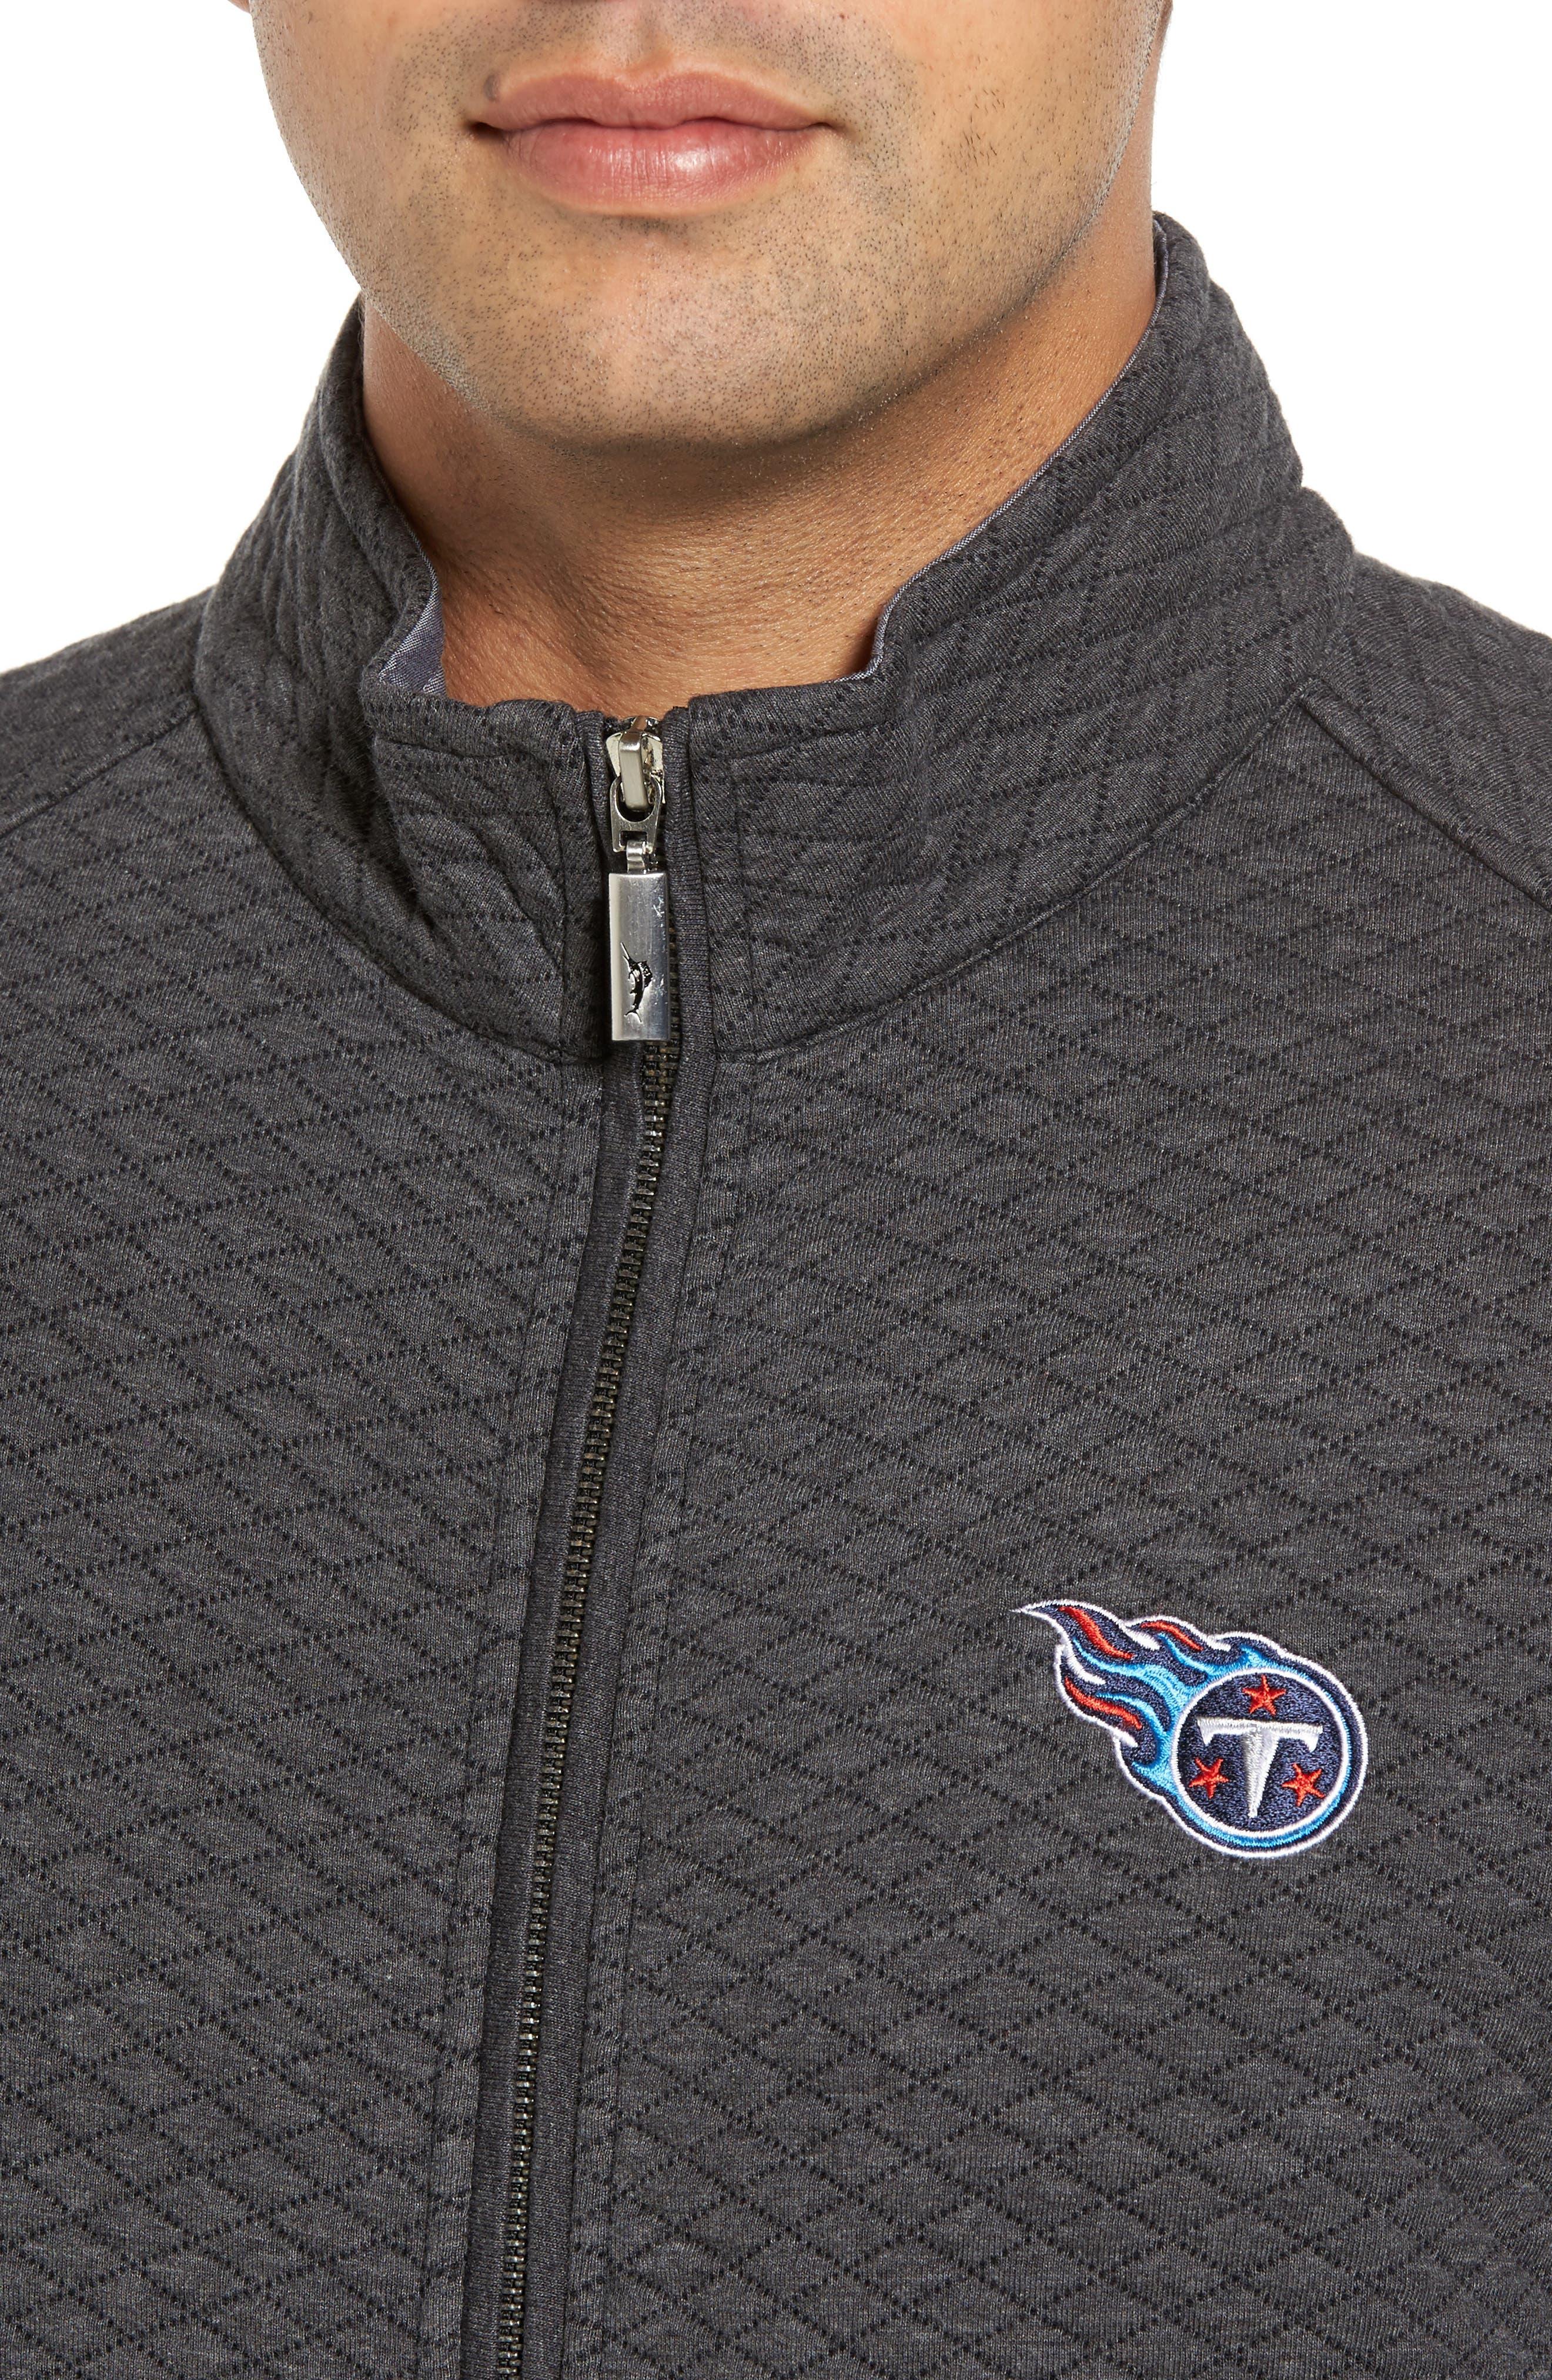 NFL Quiltessential Full Zip Sweatshirt,                             Alternate thumbnail 123, color,